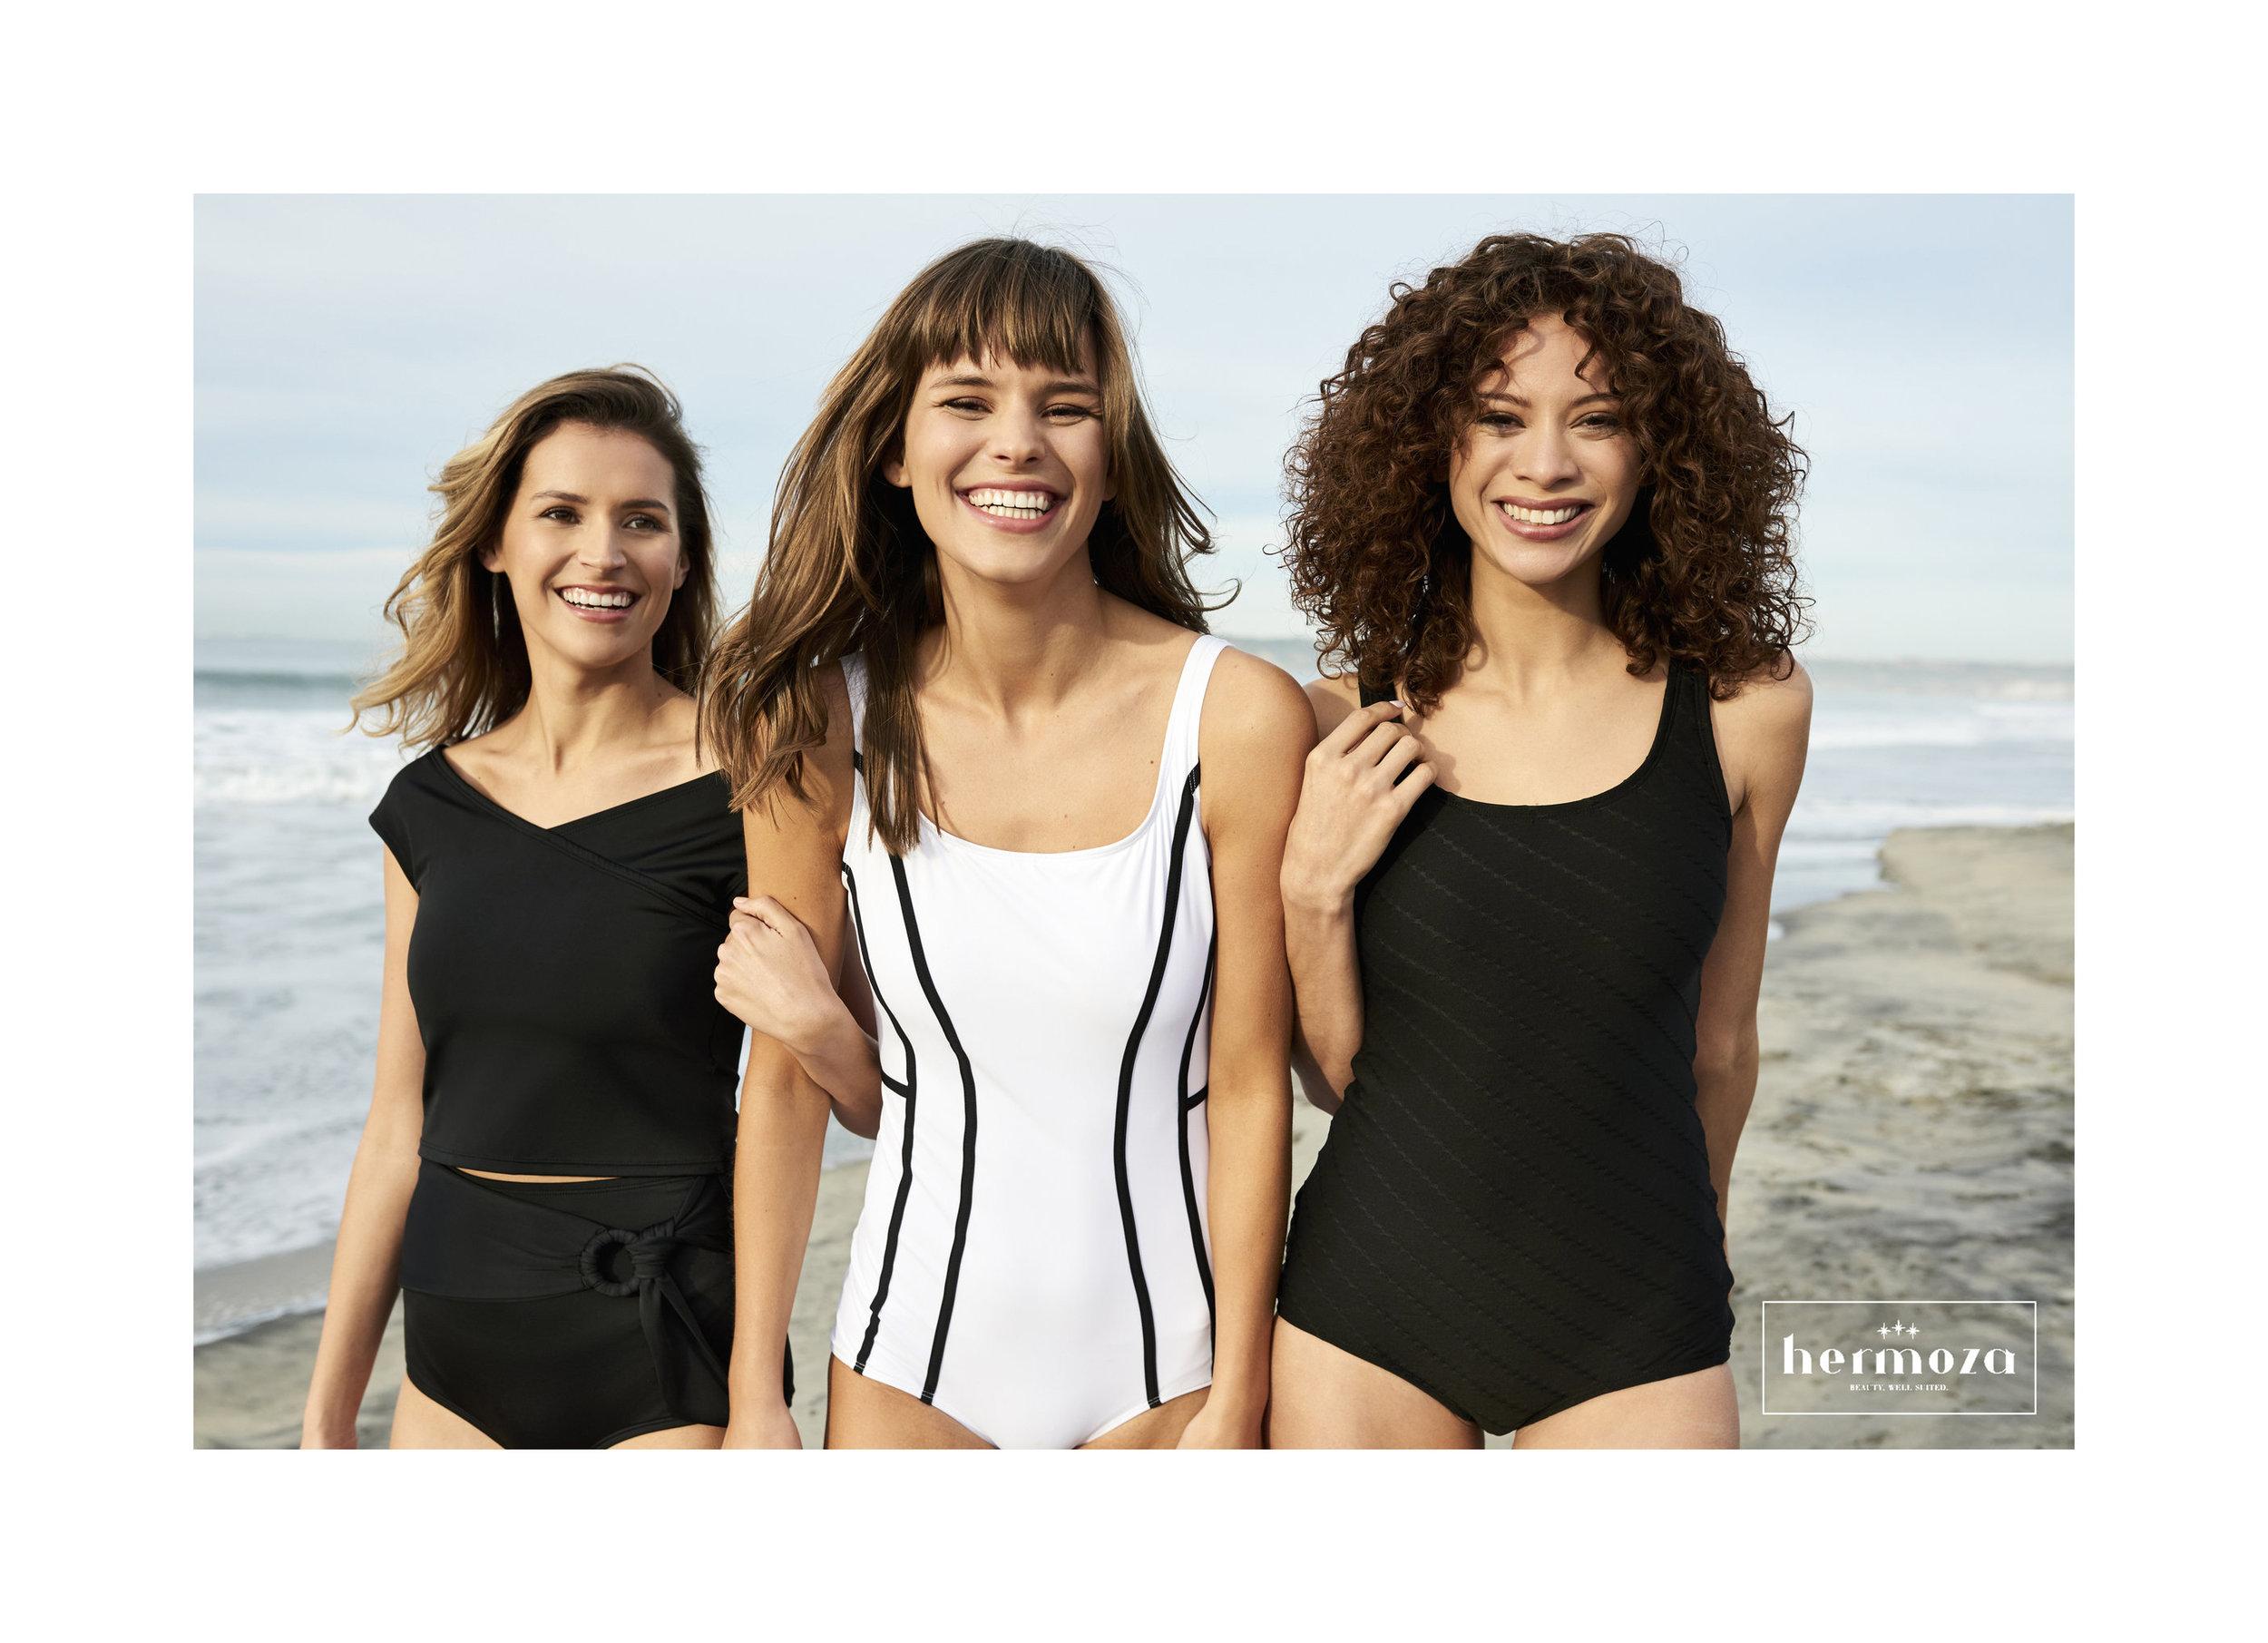 Hermoza Swimwear